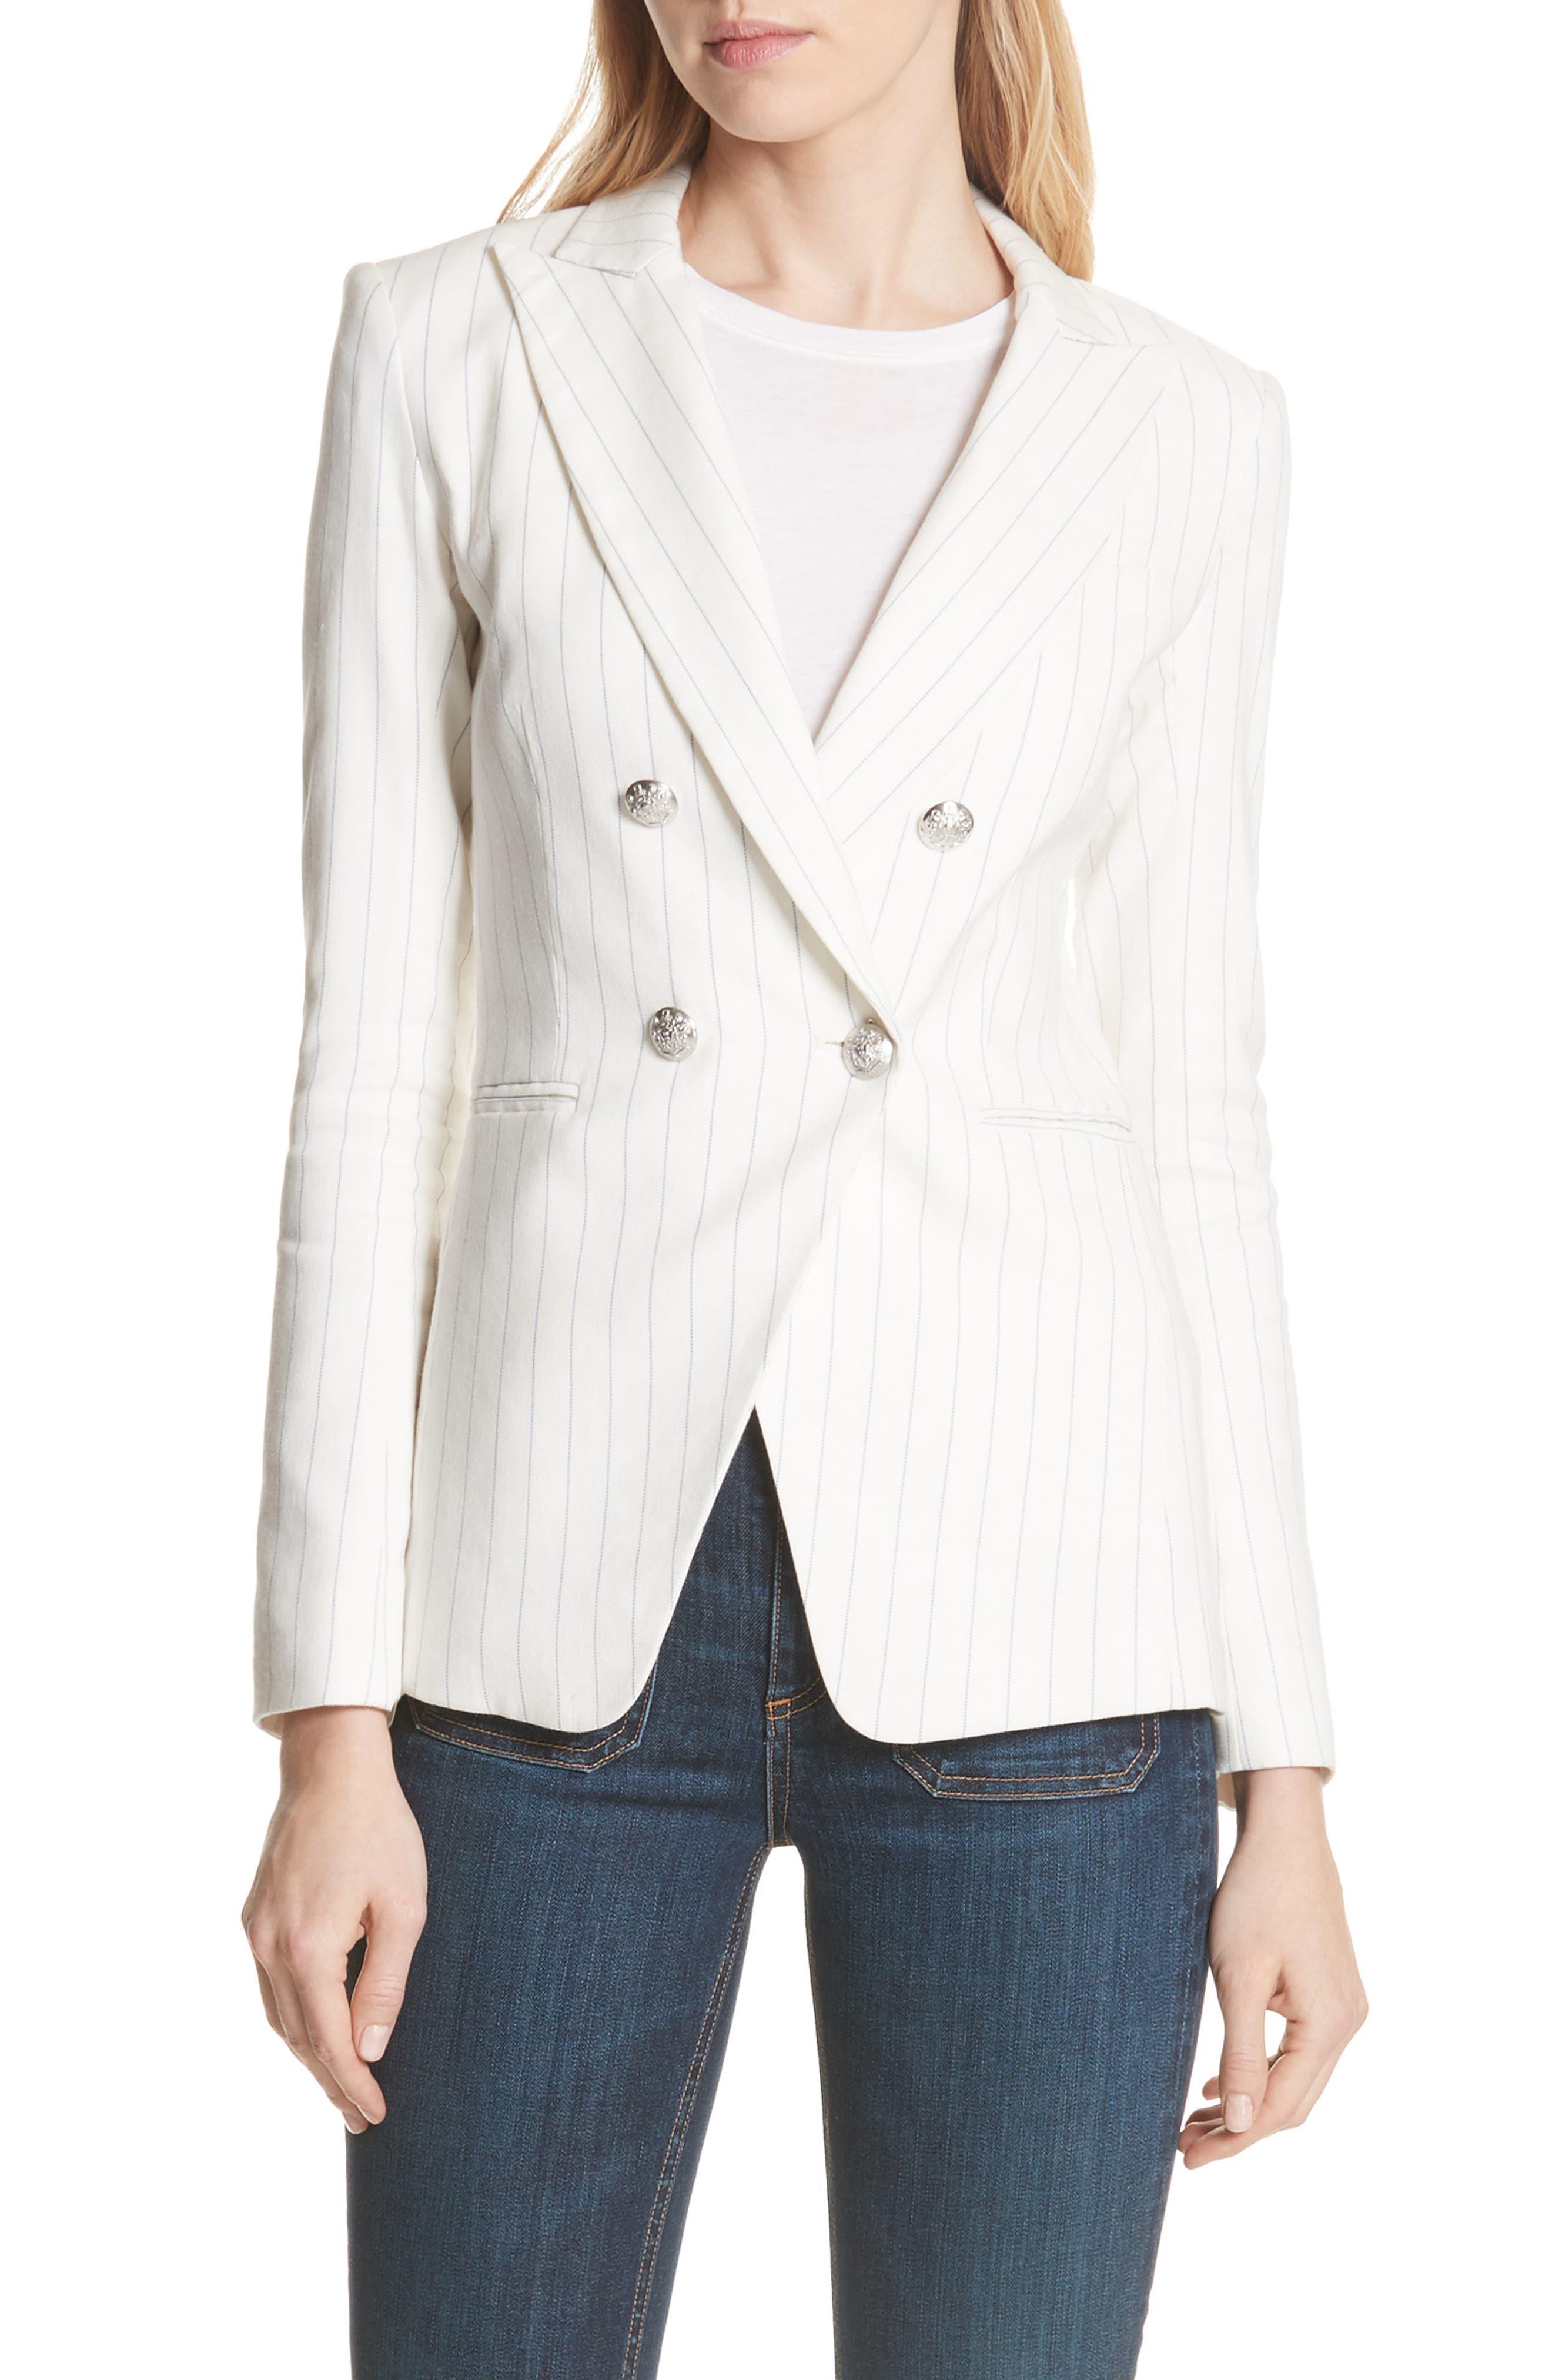 Apollo Pinstripe Jacket,                         Main,                         color, Off White/ Blue Stripe